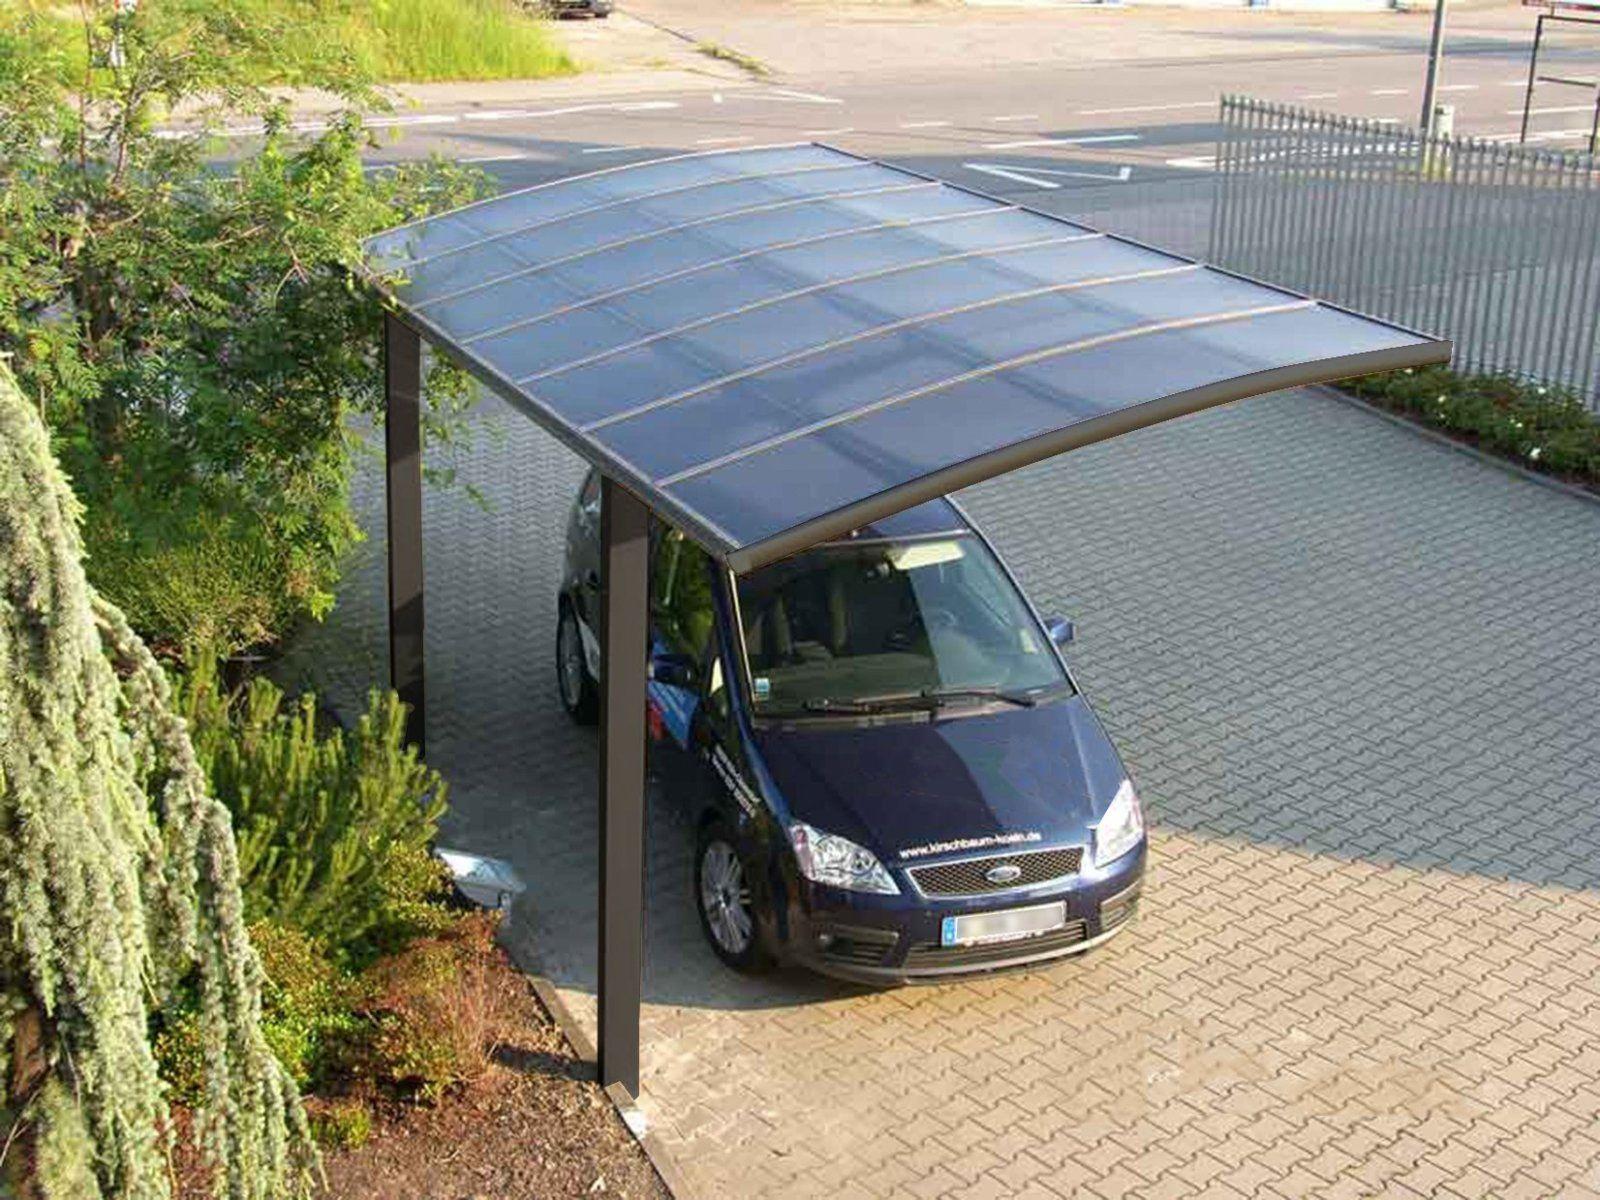 Carports Carport Designs Car Porch Design Carport Canopy